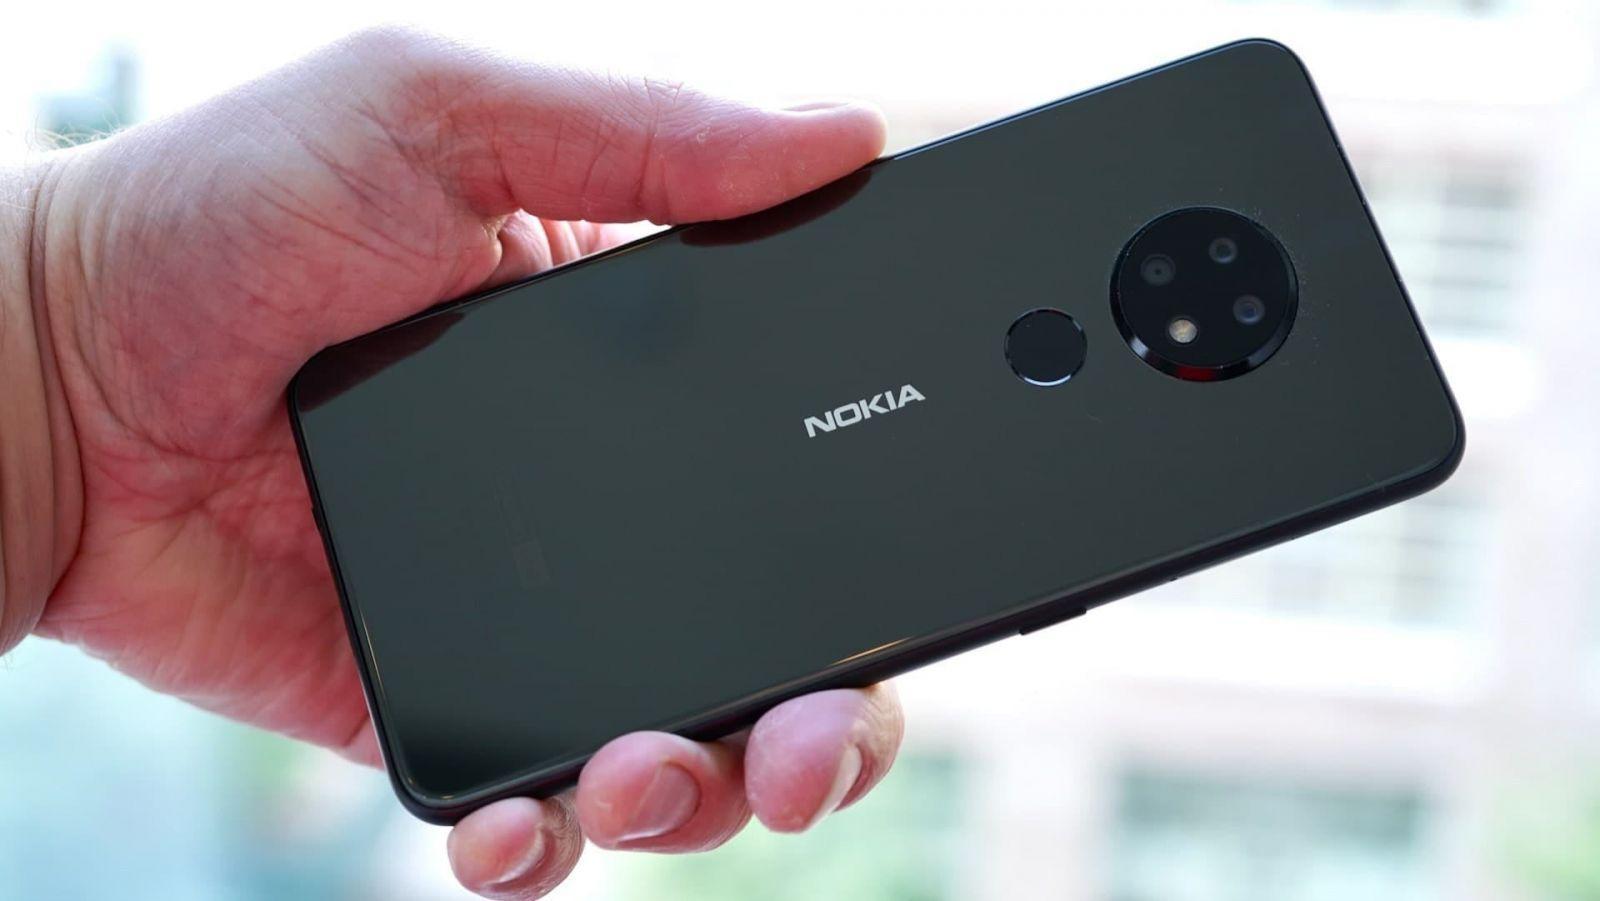 Nokia открыла предзаказ на новые смартфоны (nokia 6.2)